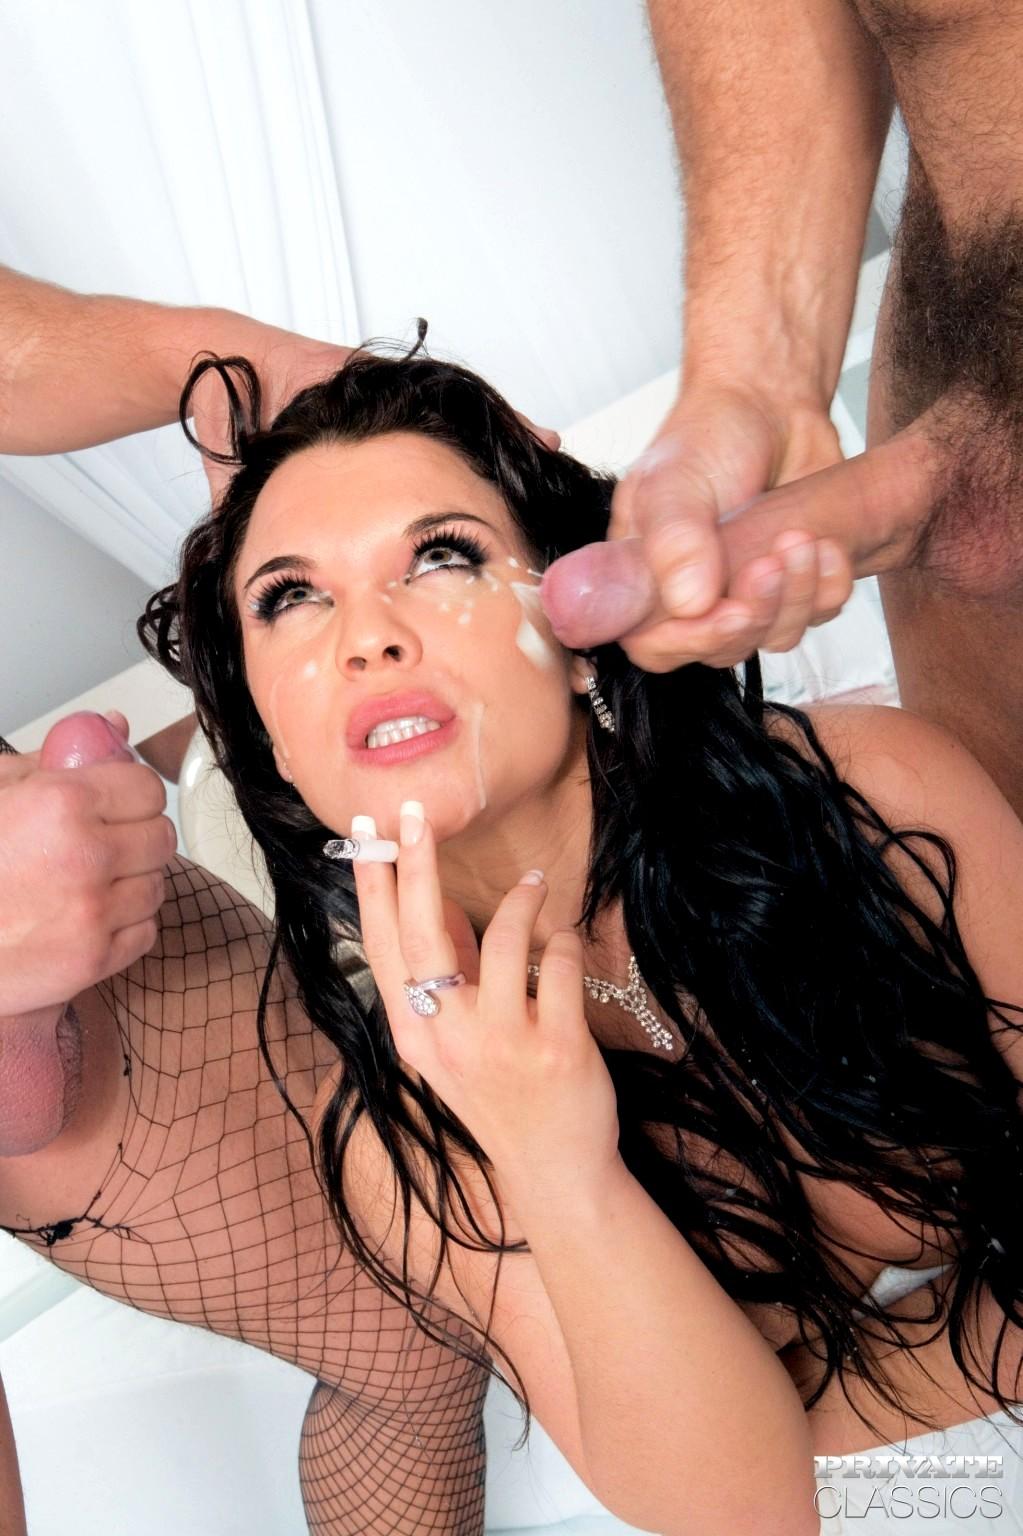 Babe Today Private Classics Anastasia Mayo Hottxxx Anal Shockingmovies  Mobile Porn Pics